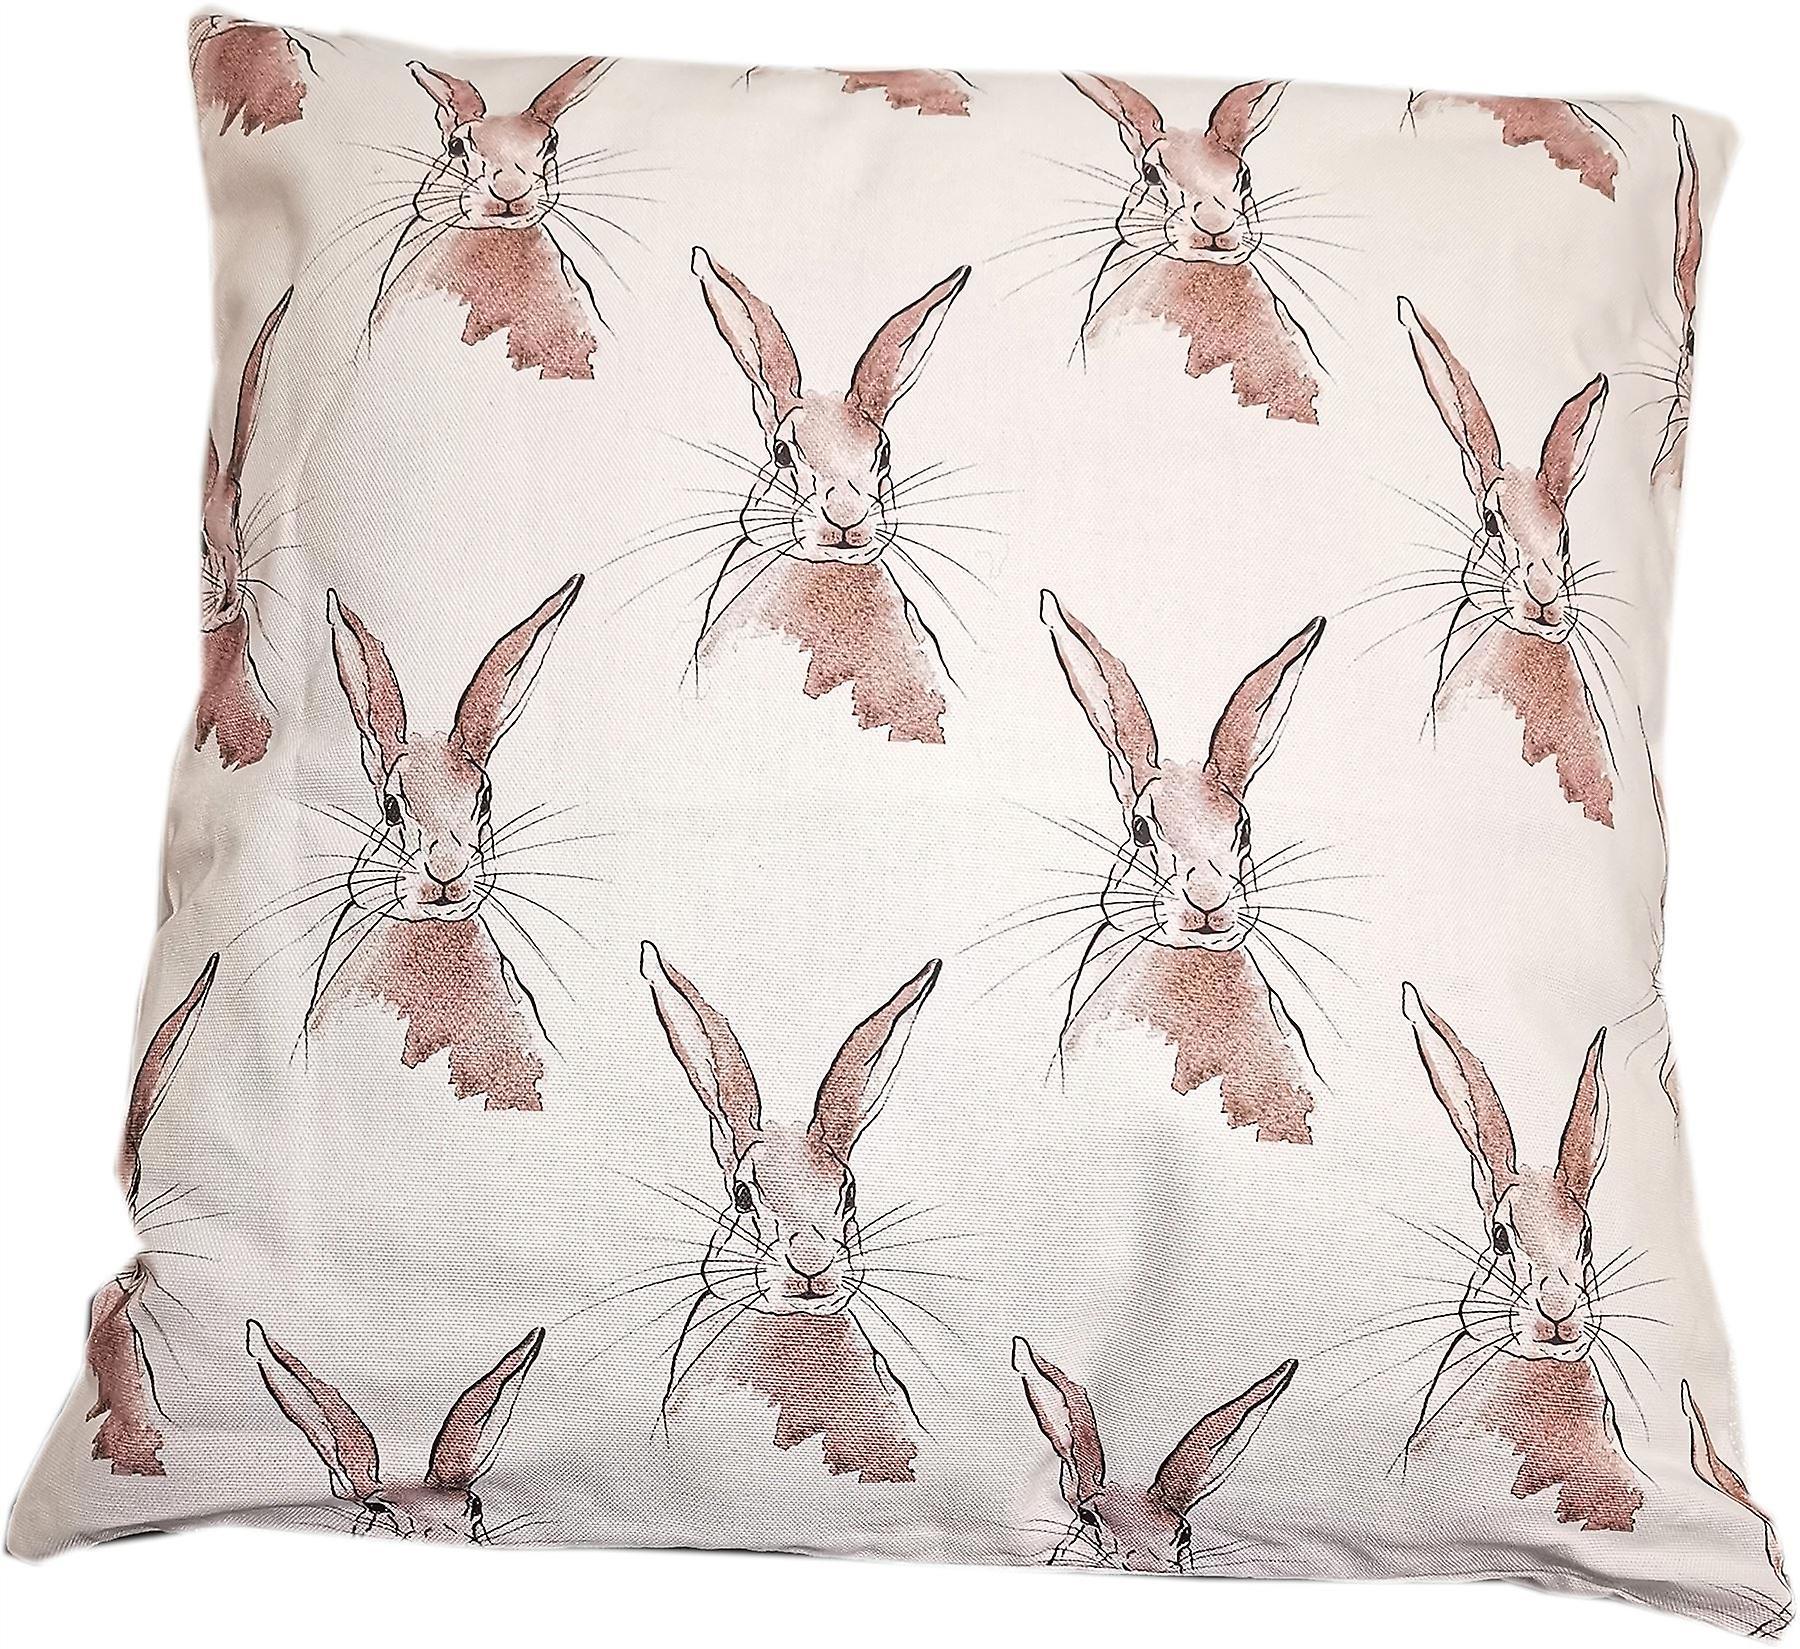 Clare Baird Highland Collection - Mountain Hare Cushion